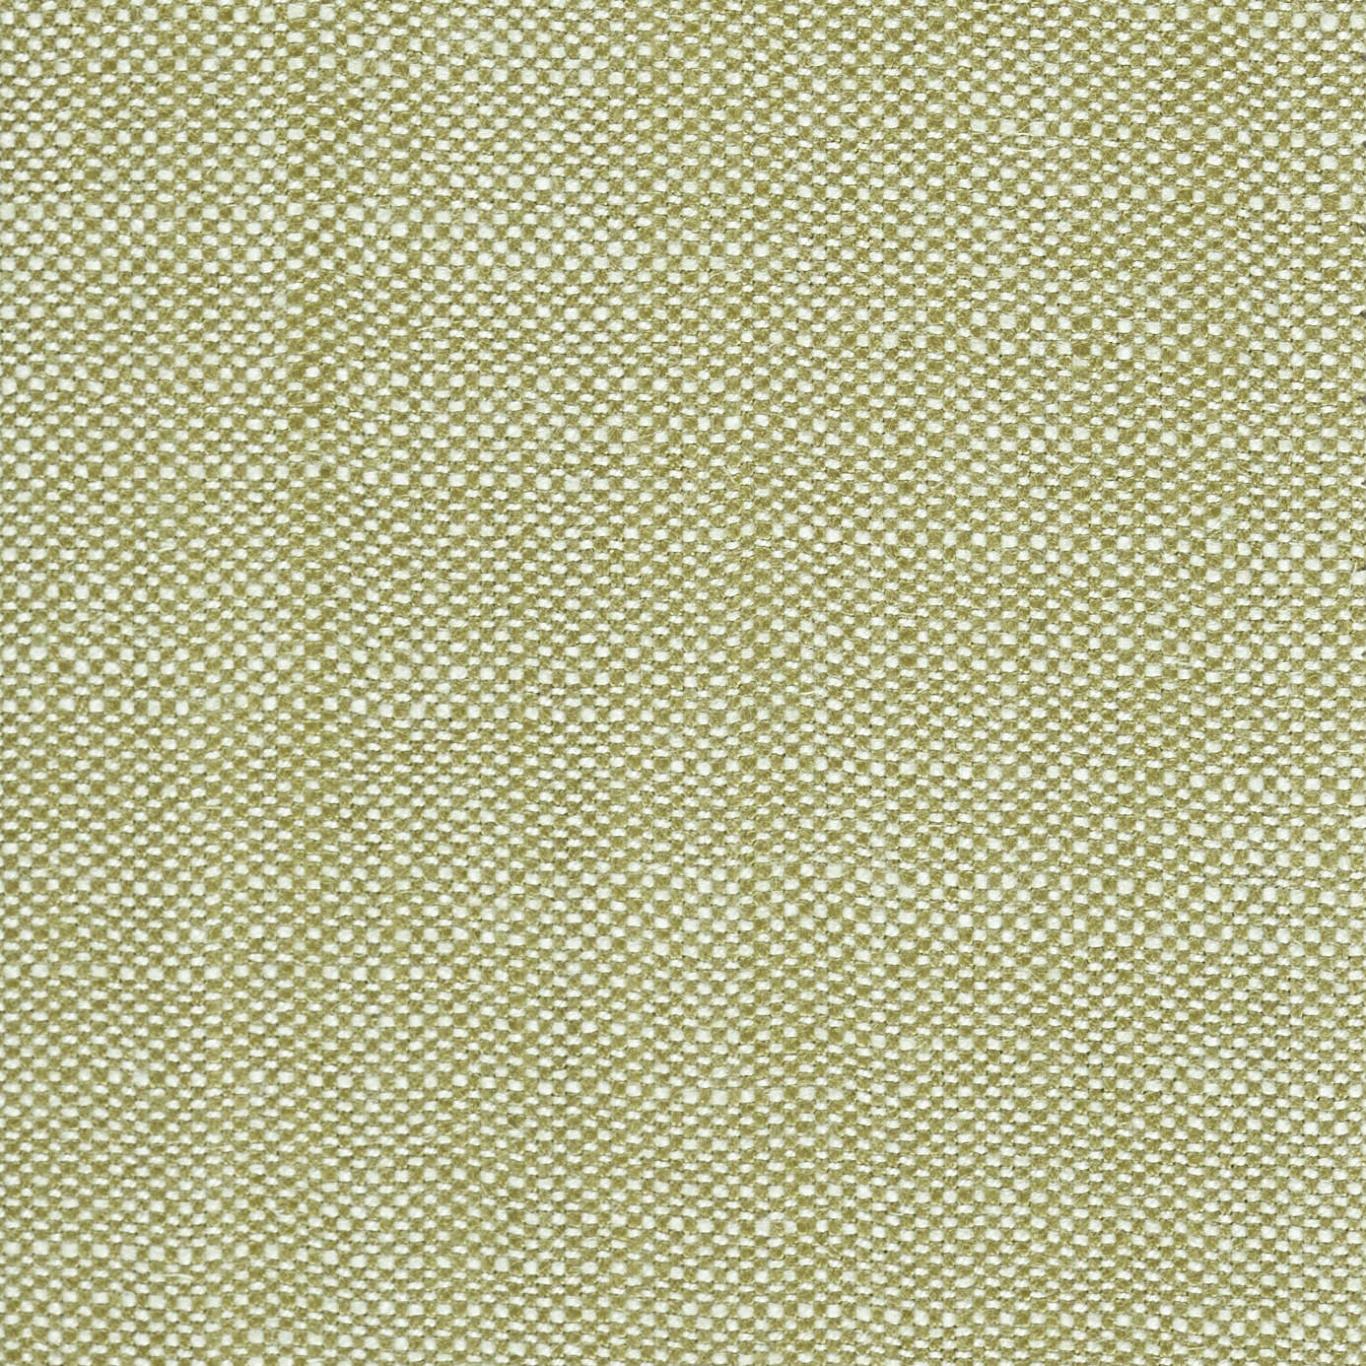 Image of Harlequin Atom Wicker Fabric 440007